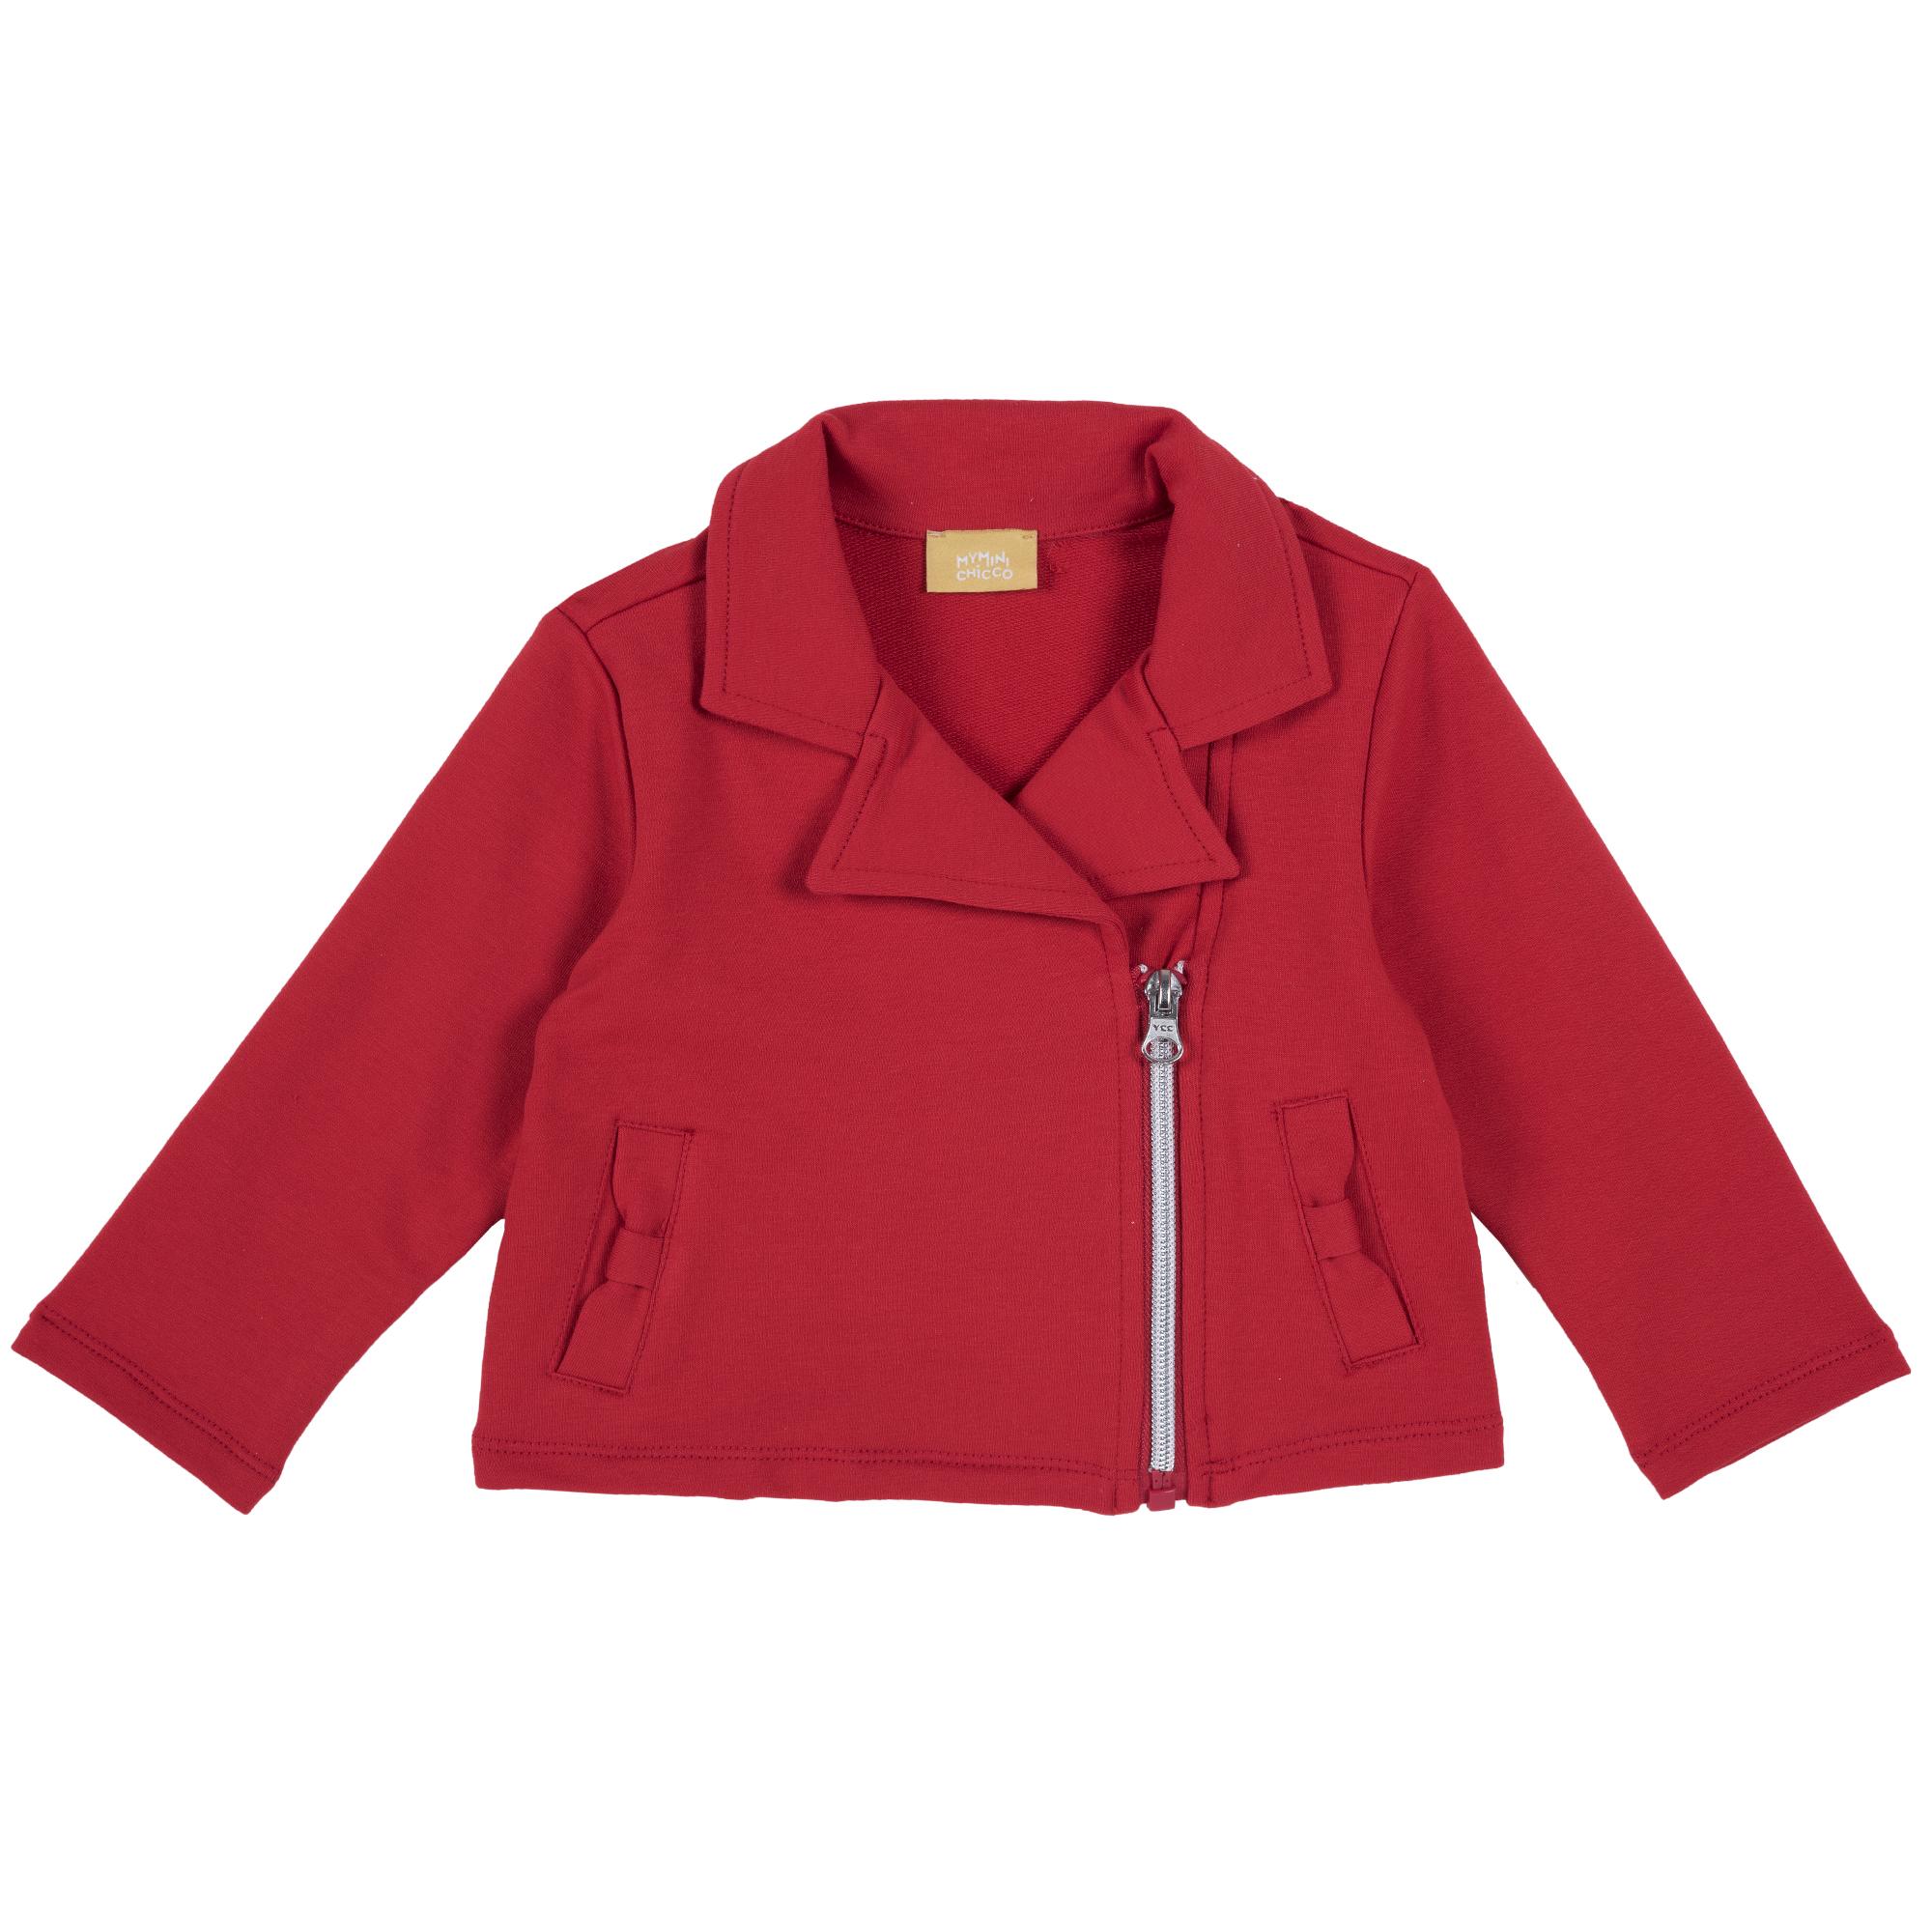 Jacheta copii chicco, rosu, 96814 din categoria Jachete copii